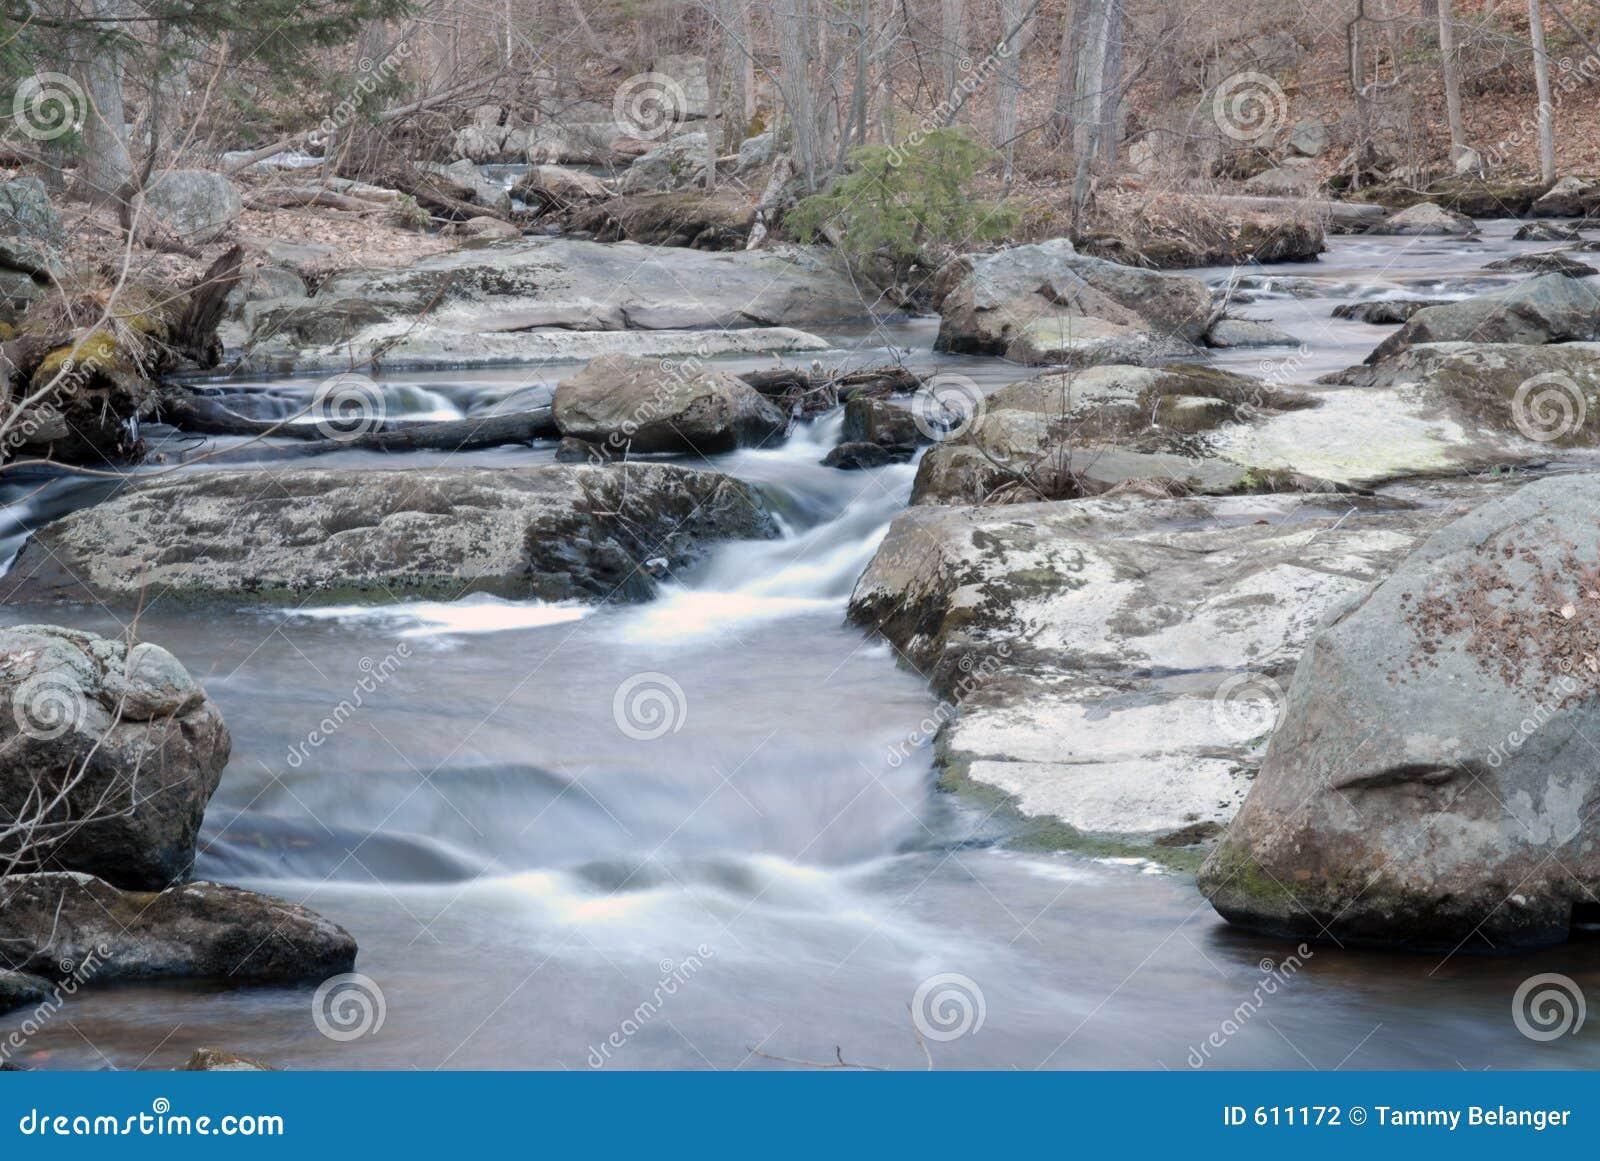 Stromende rivier en watervallen.